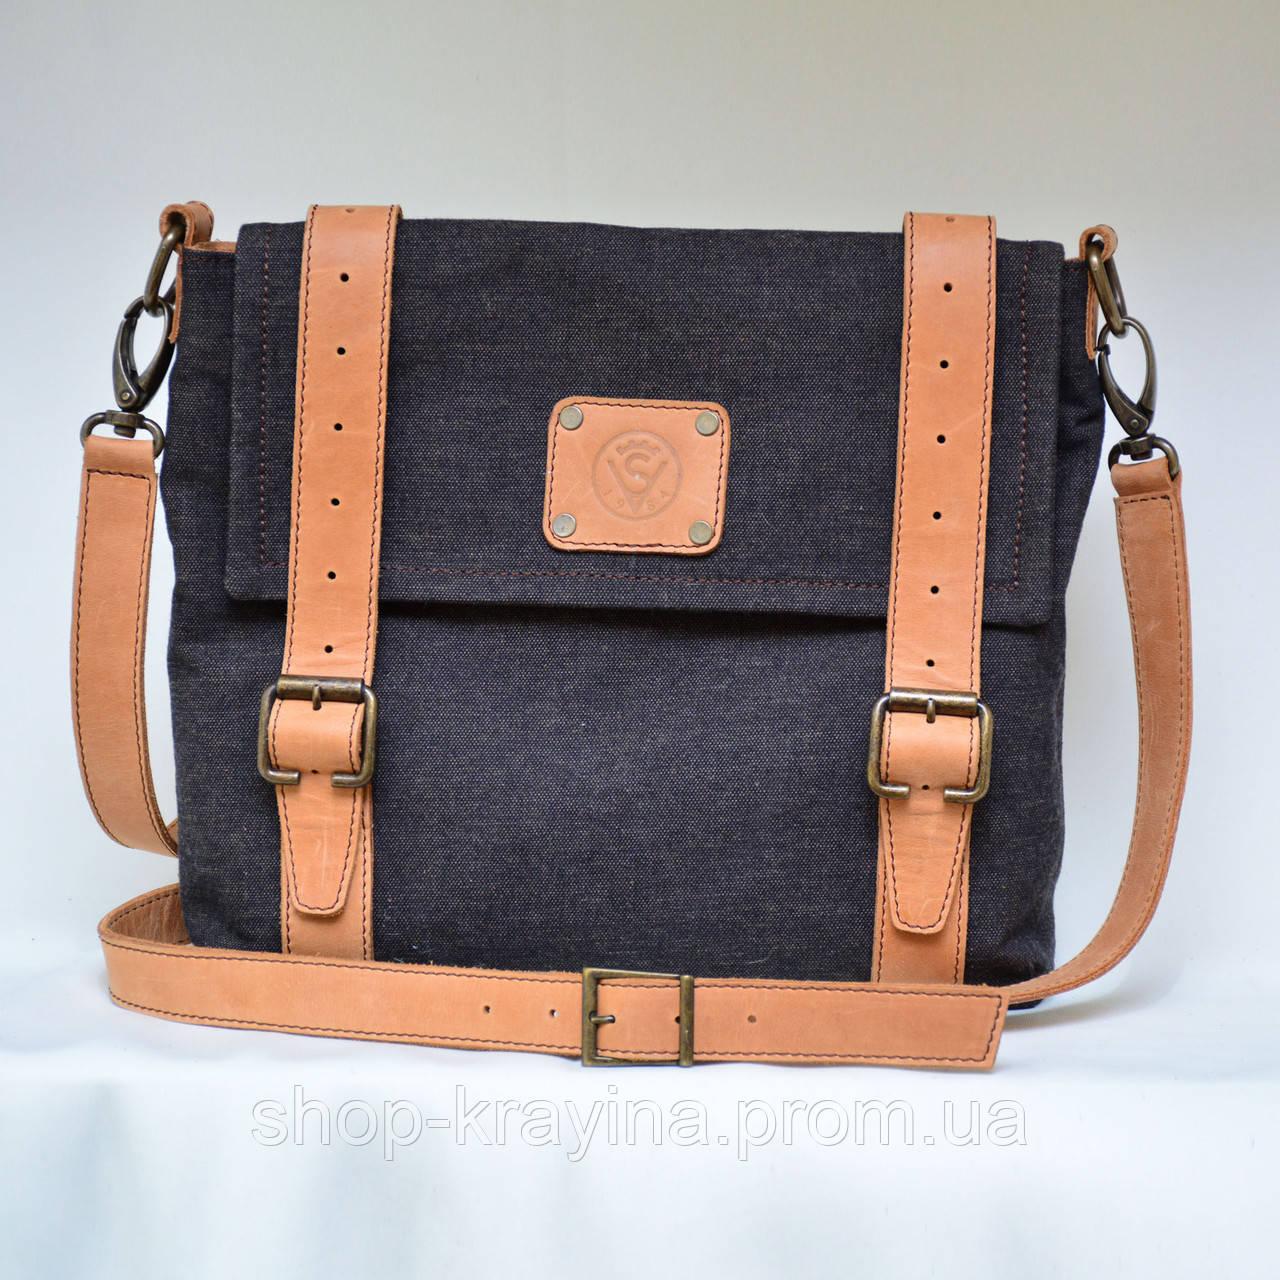 Сумка женская VS135 leather canvas 30х28х7 см